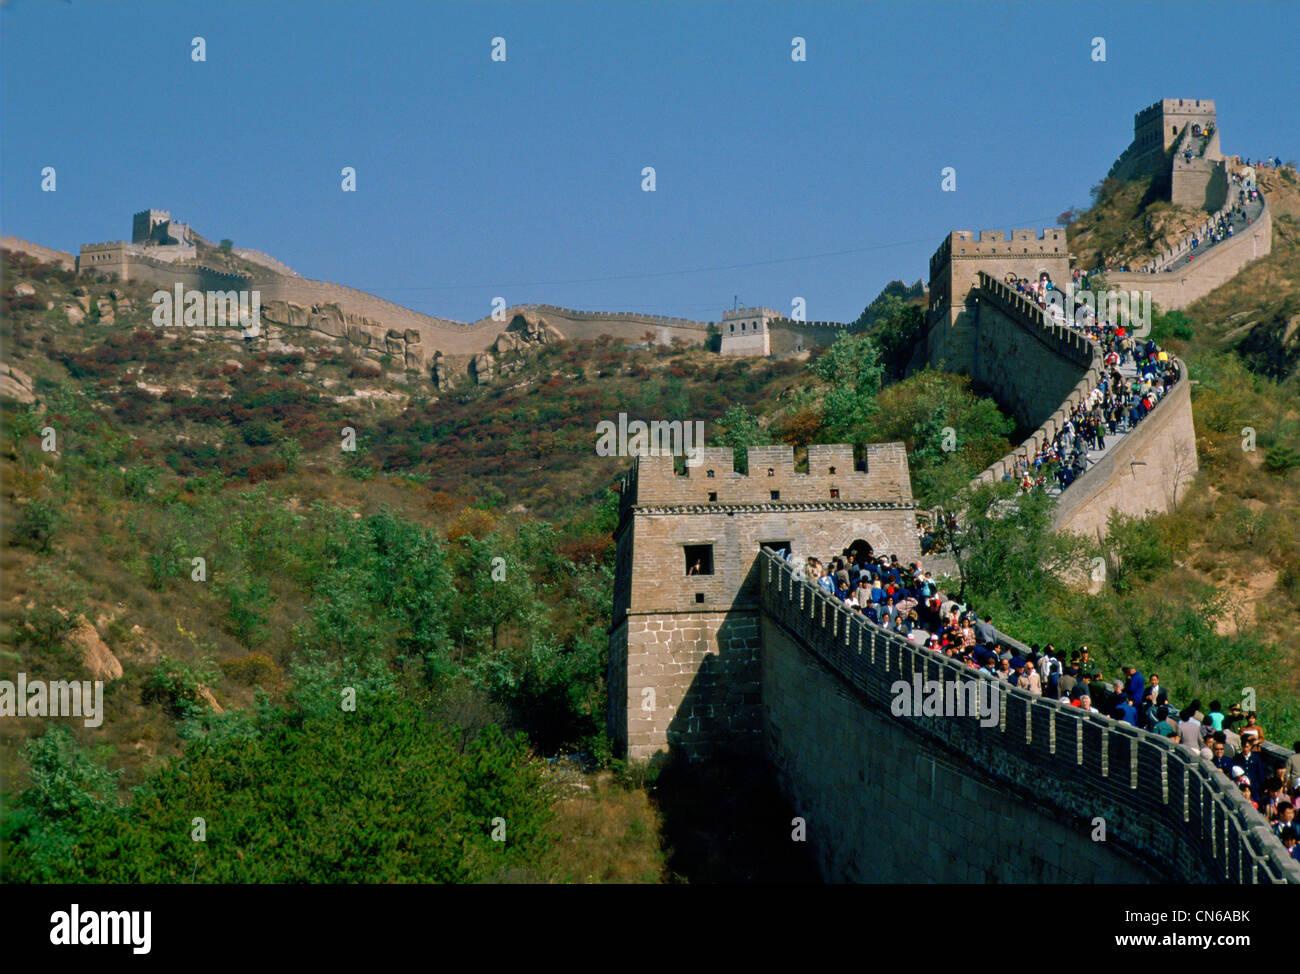 Great Wall Of China. - Stock Image